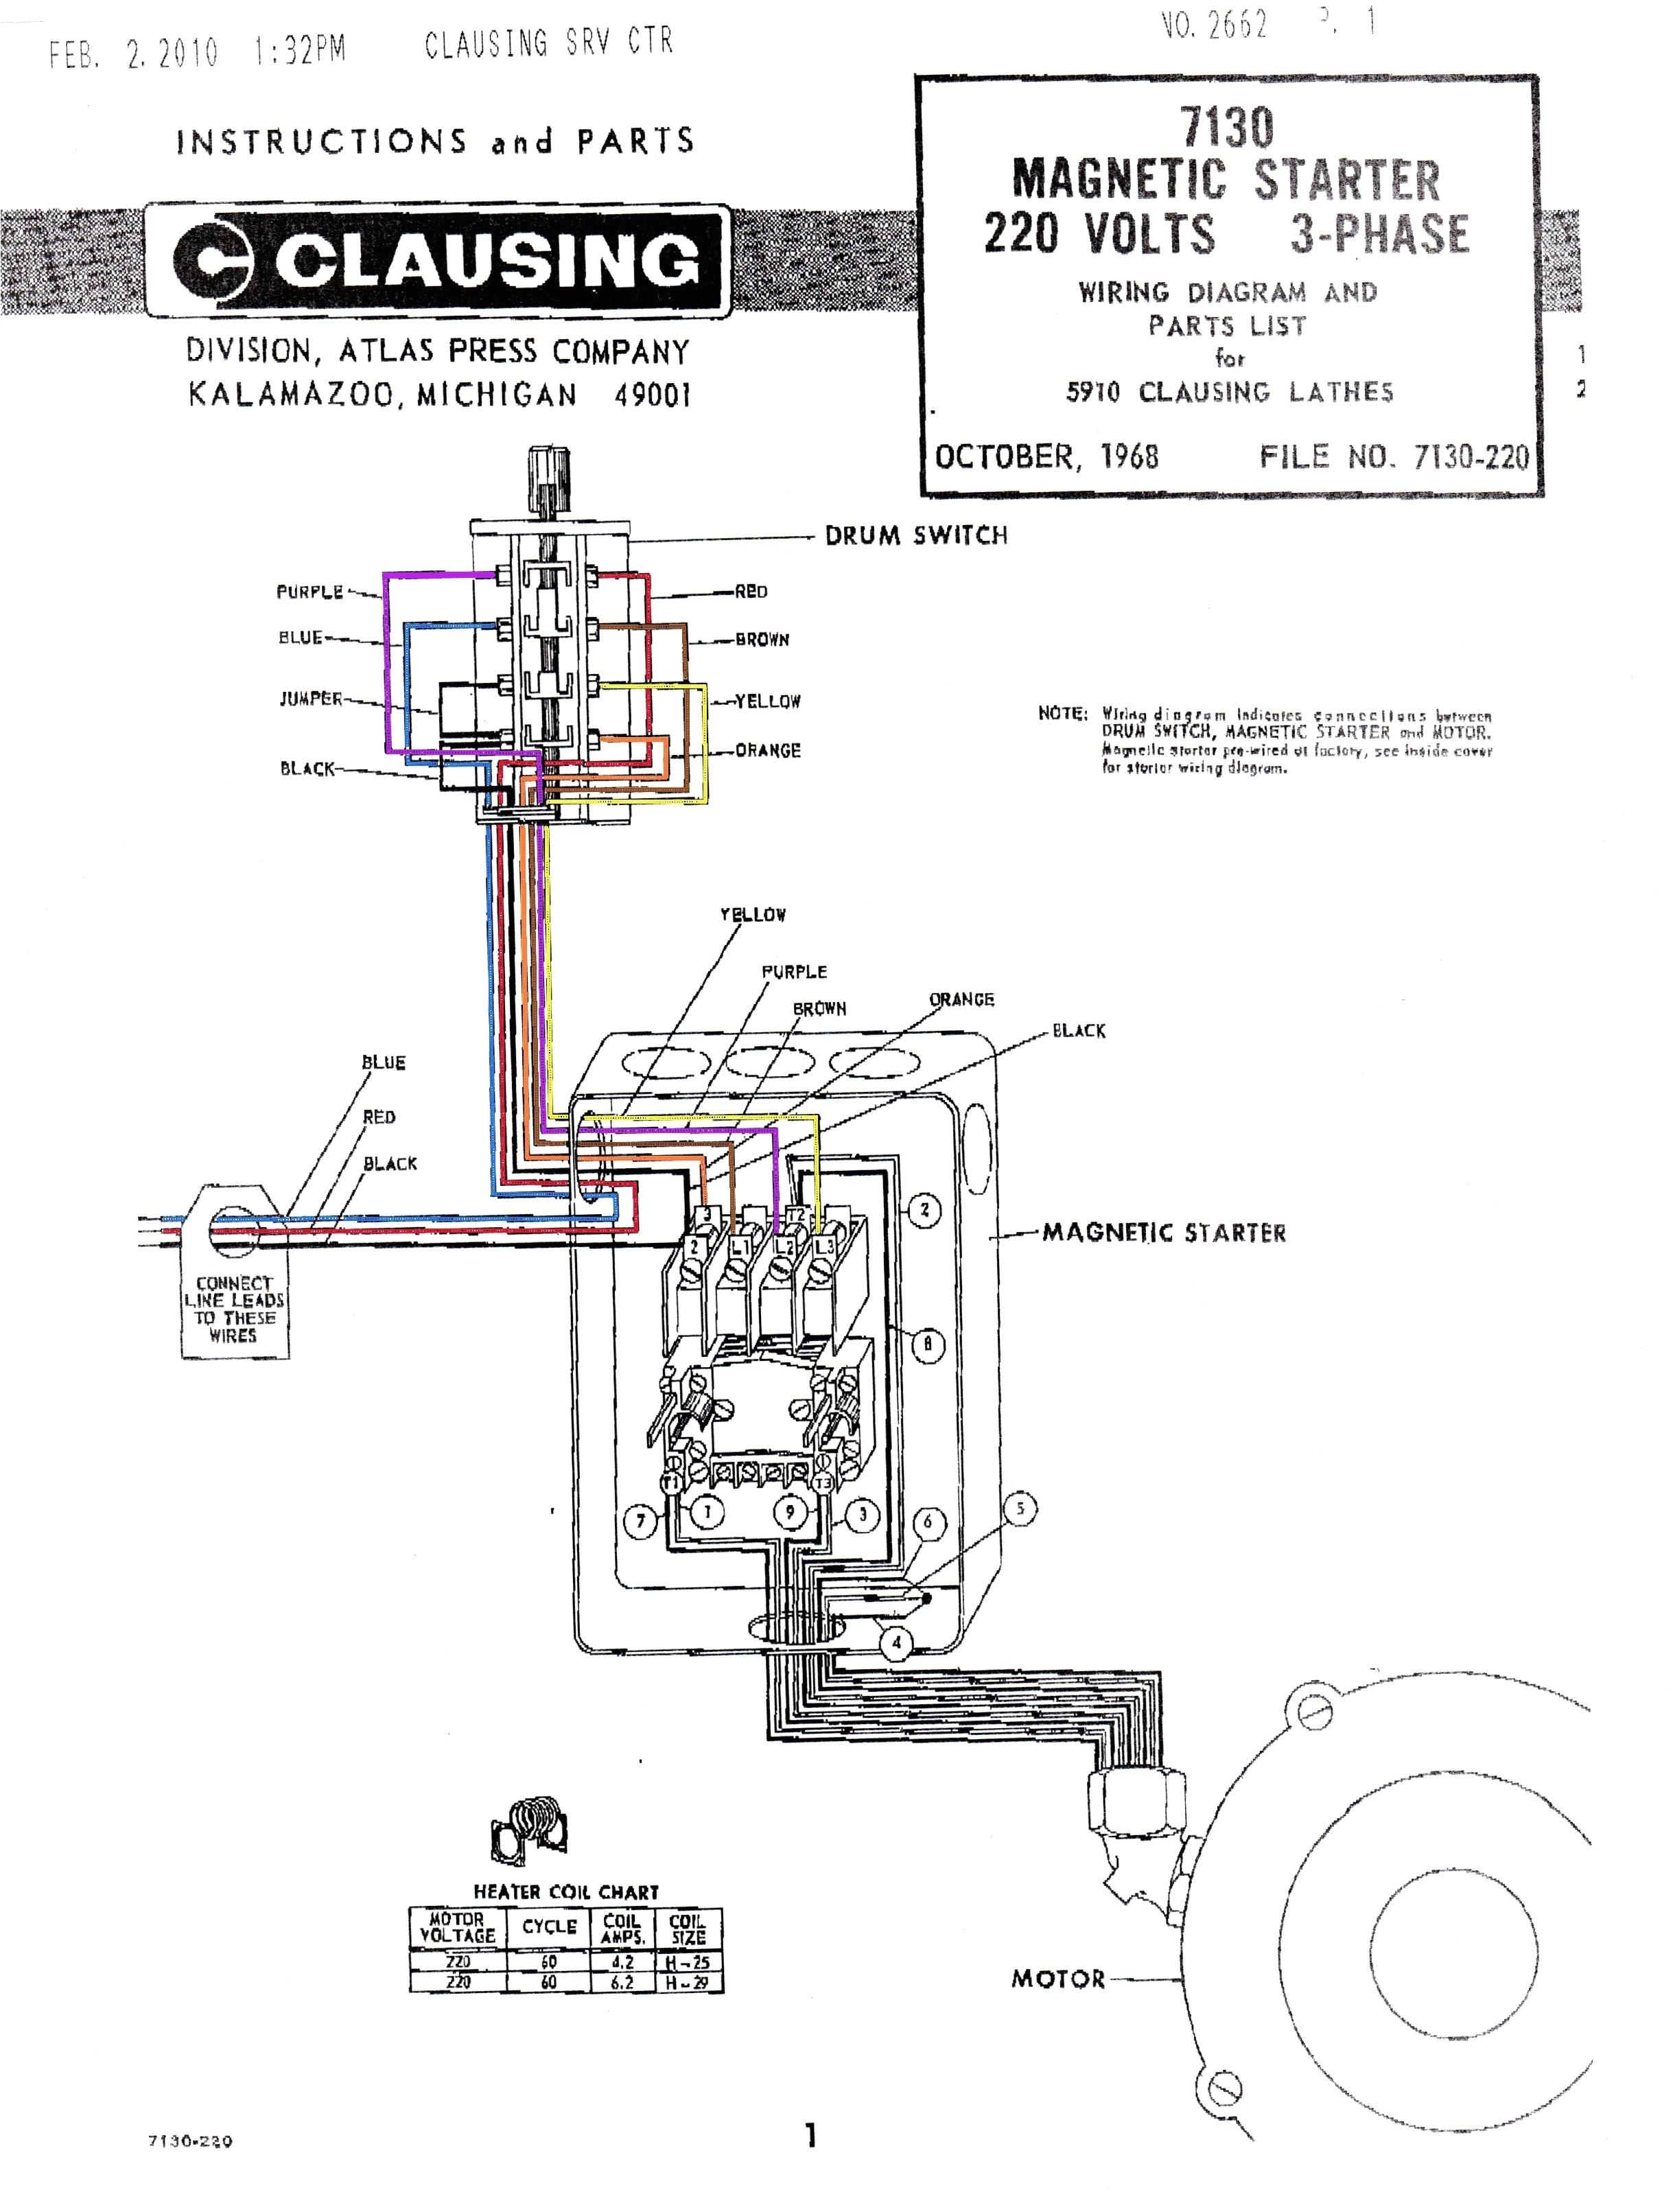 ge 12726 wiring diagram lovely wiring diagrams motor controls old ge motor wiring diagram for jpg